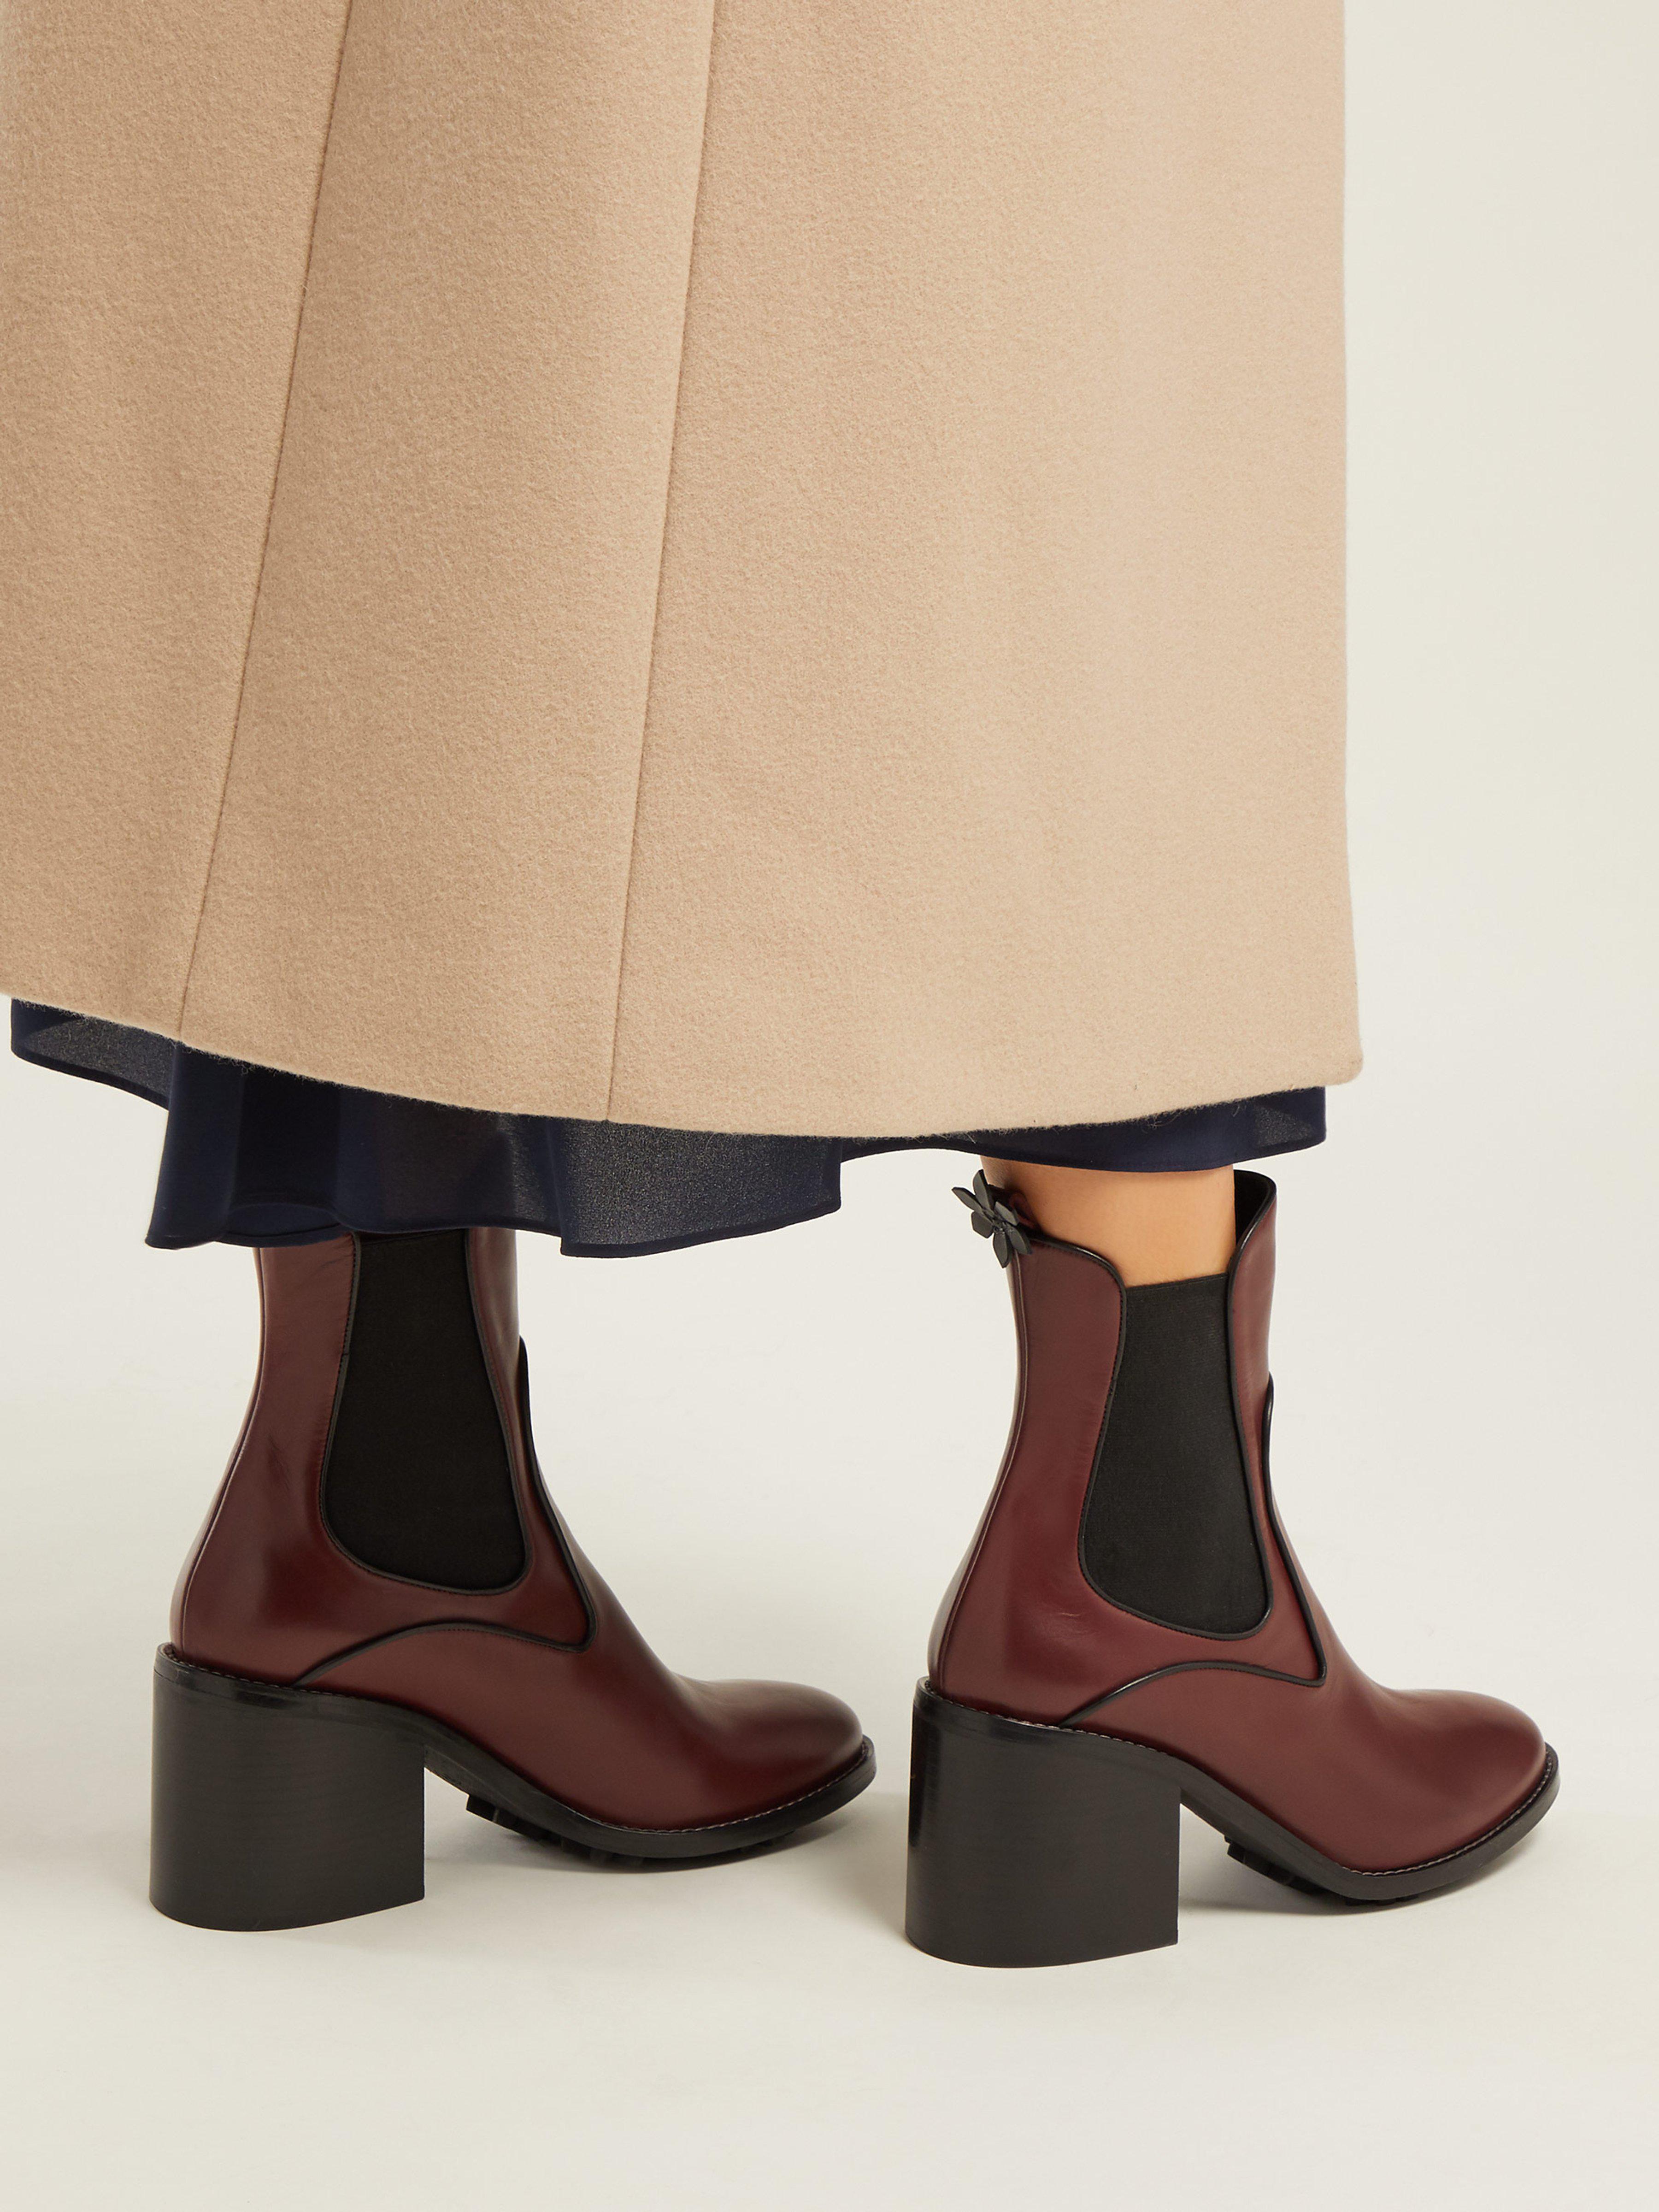 73c373c3d3225 Fabrizio Viti - Multicolor Madison Leather Ankle Boots - Lyst. View  fullscreen